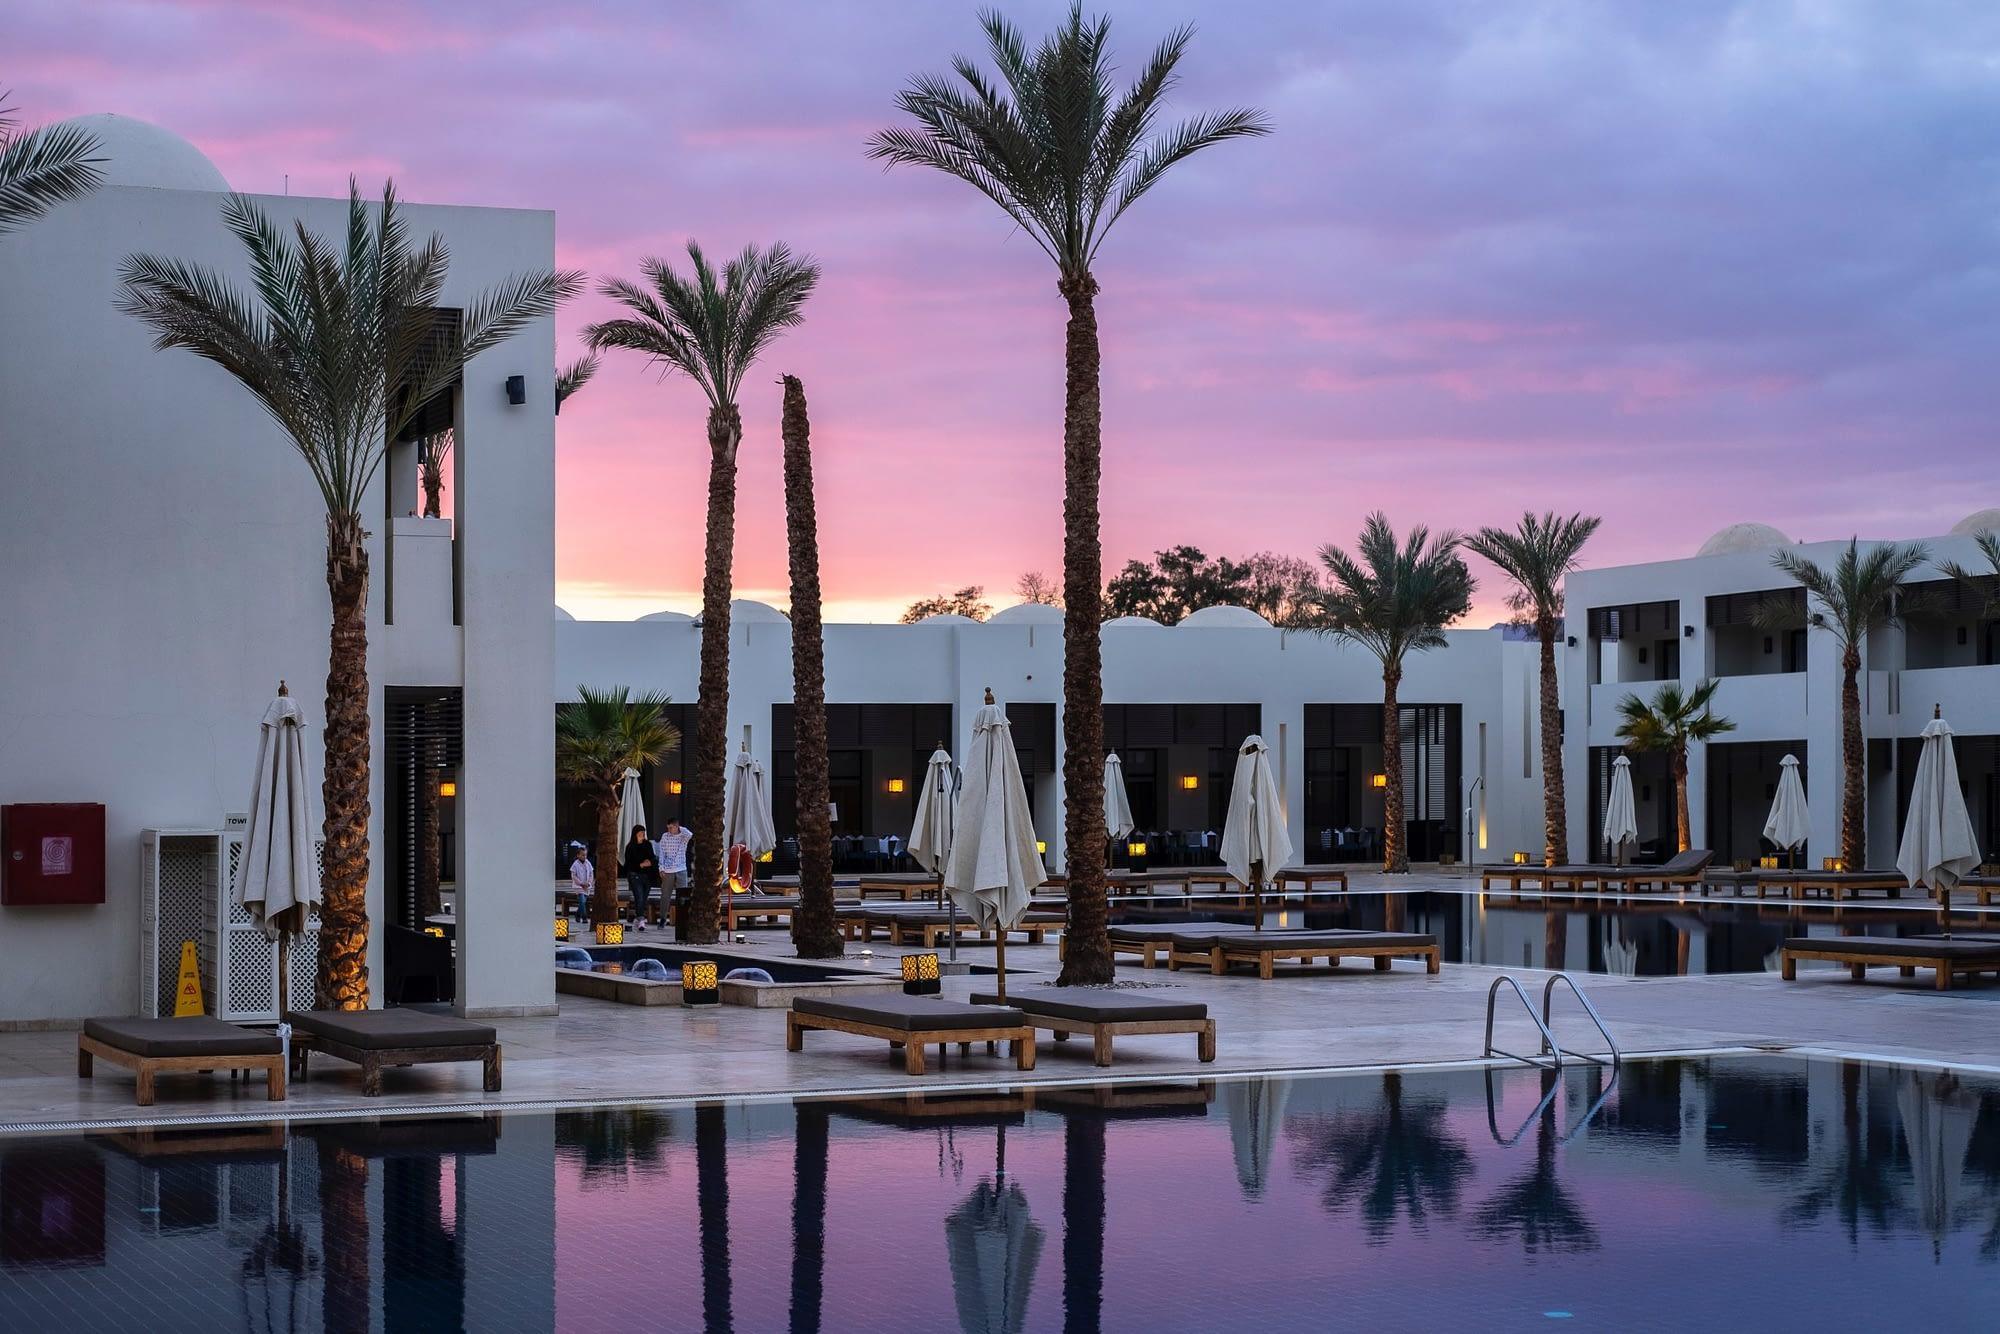 Resort by pool